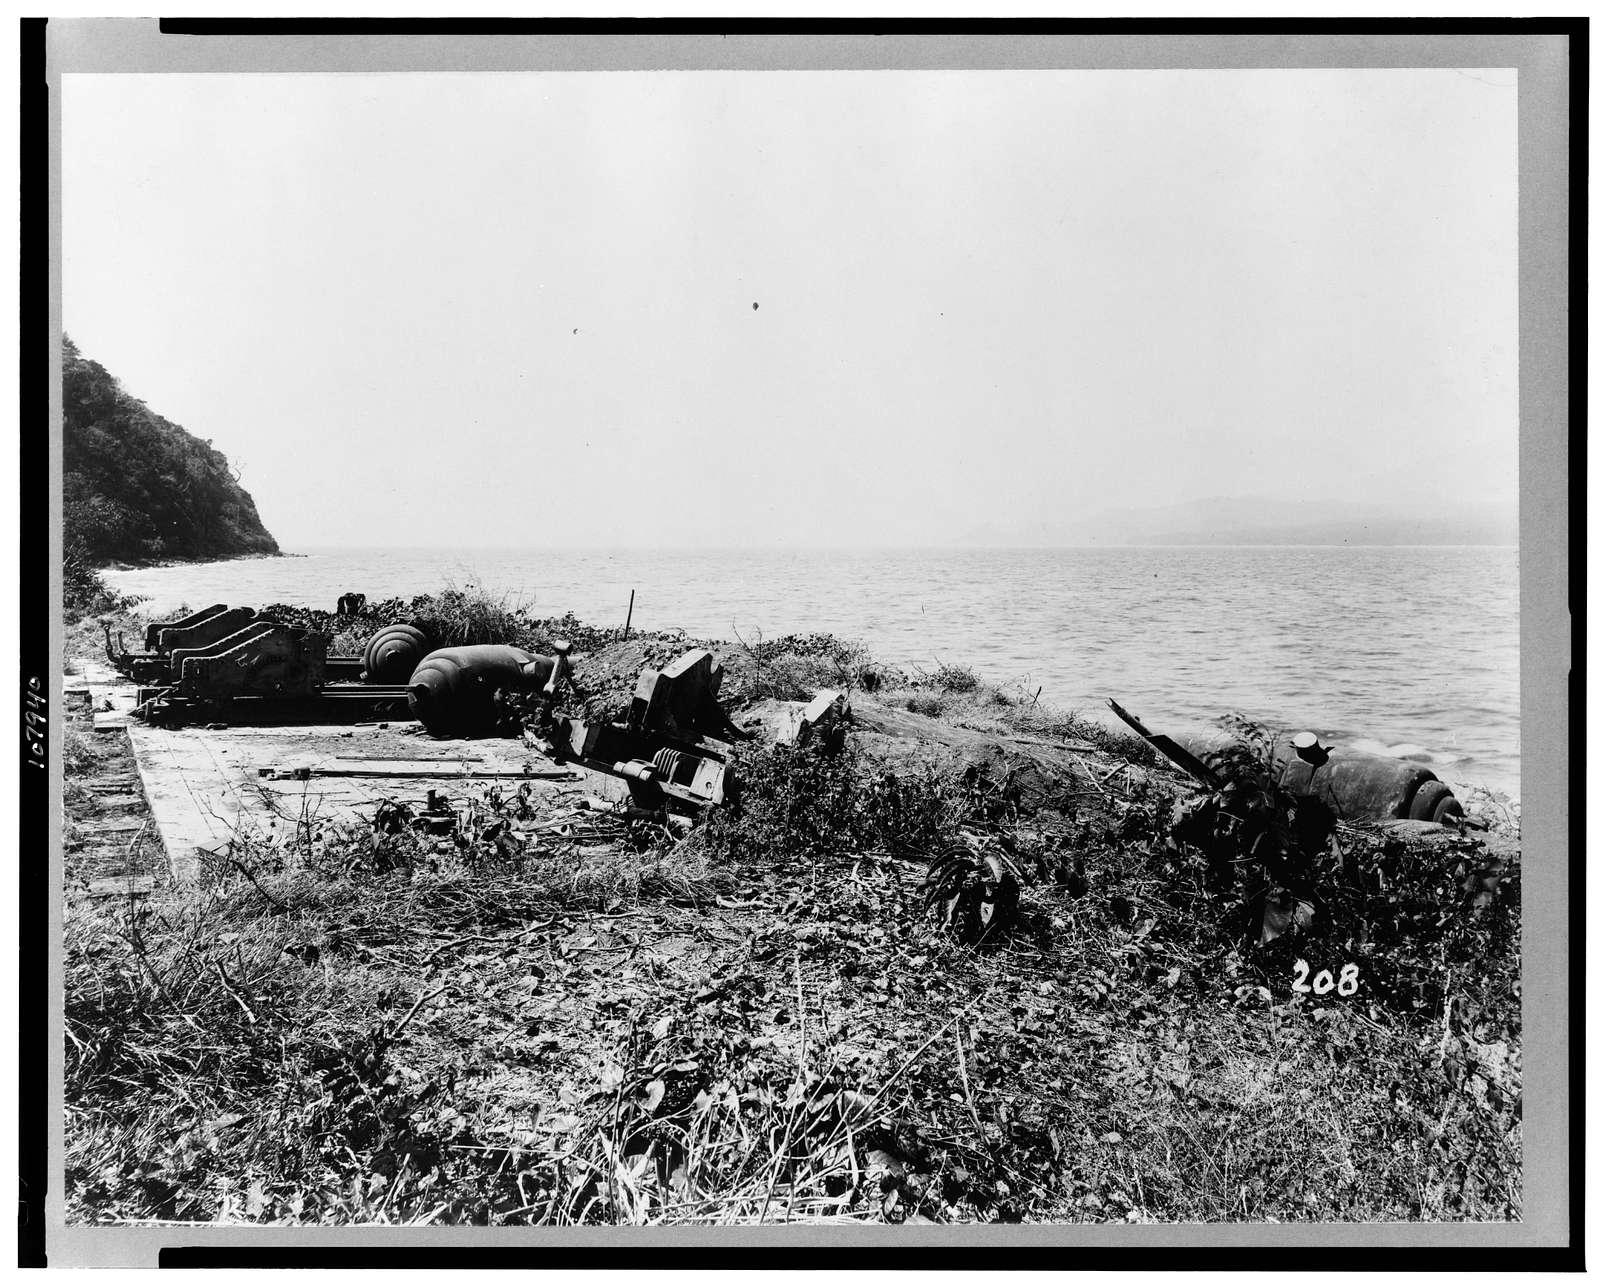 [Dismantled battery, first to fire on Dewey's fleet, Corregidor, Philippine Islands]